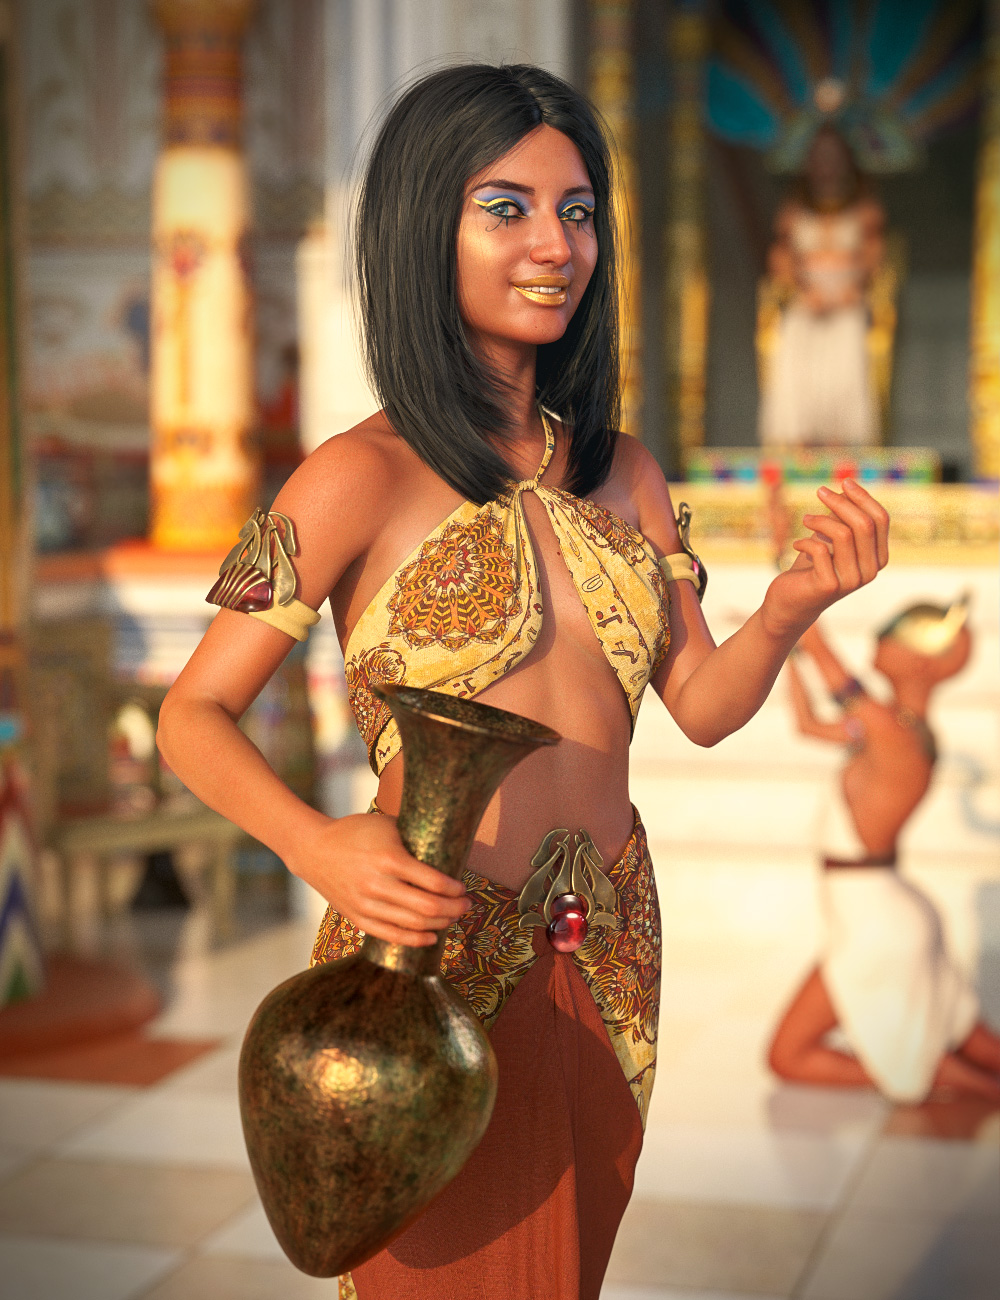 Khemsit 8 Ancient Egyptian Handmaiden Bundle by: , 3D Models by Daz 3D